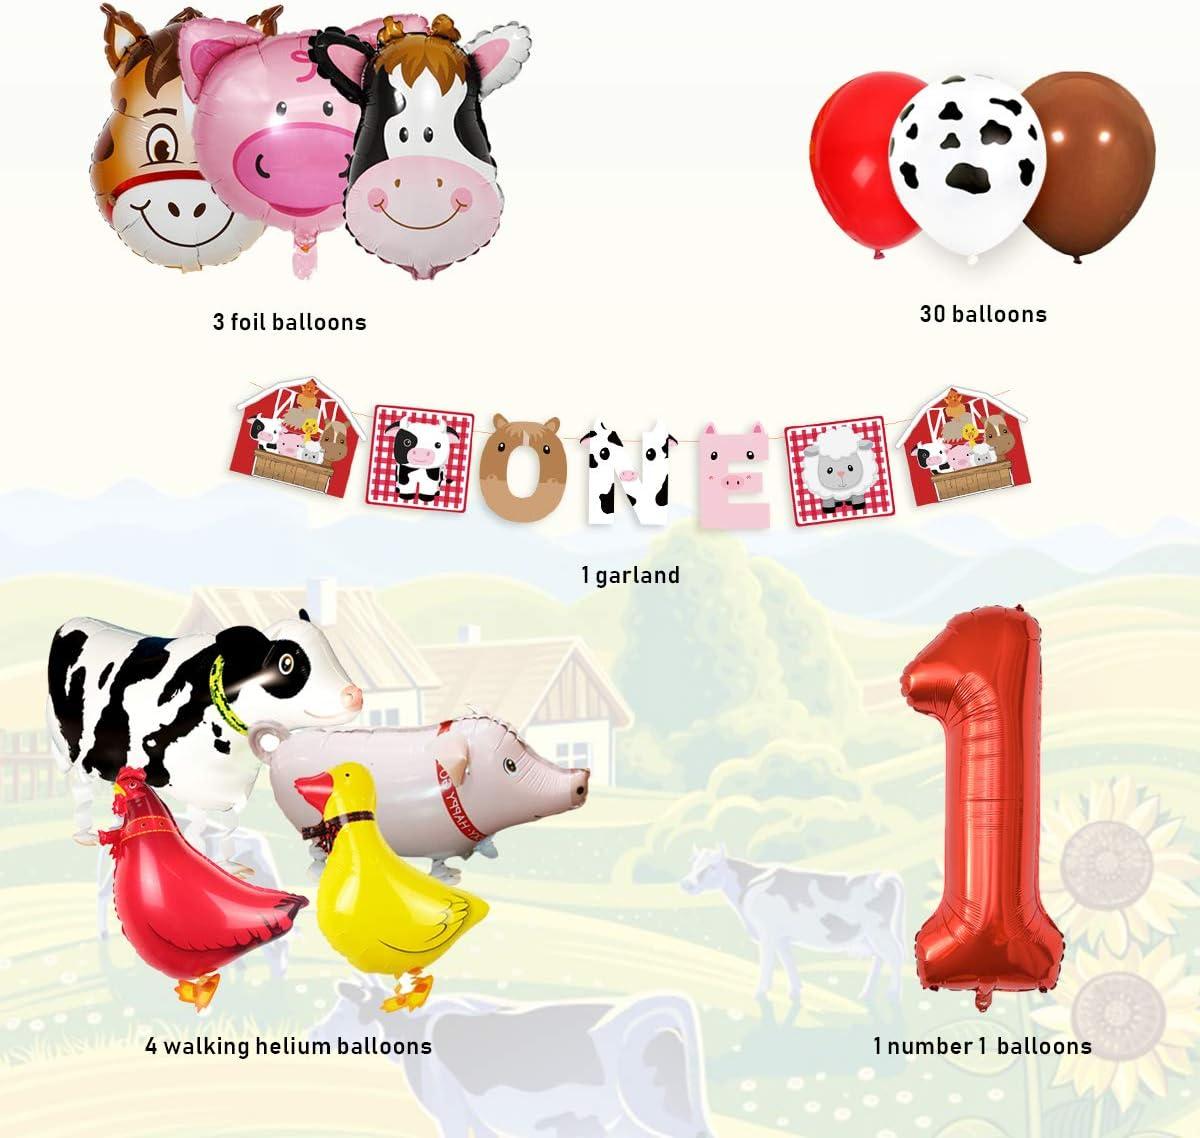 Cute Walking Balloon Pet Cute Sheep Helium Balloon Kids Toy Party Decoratio ÁÁ